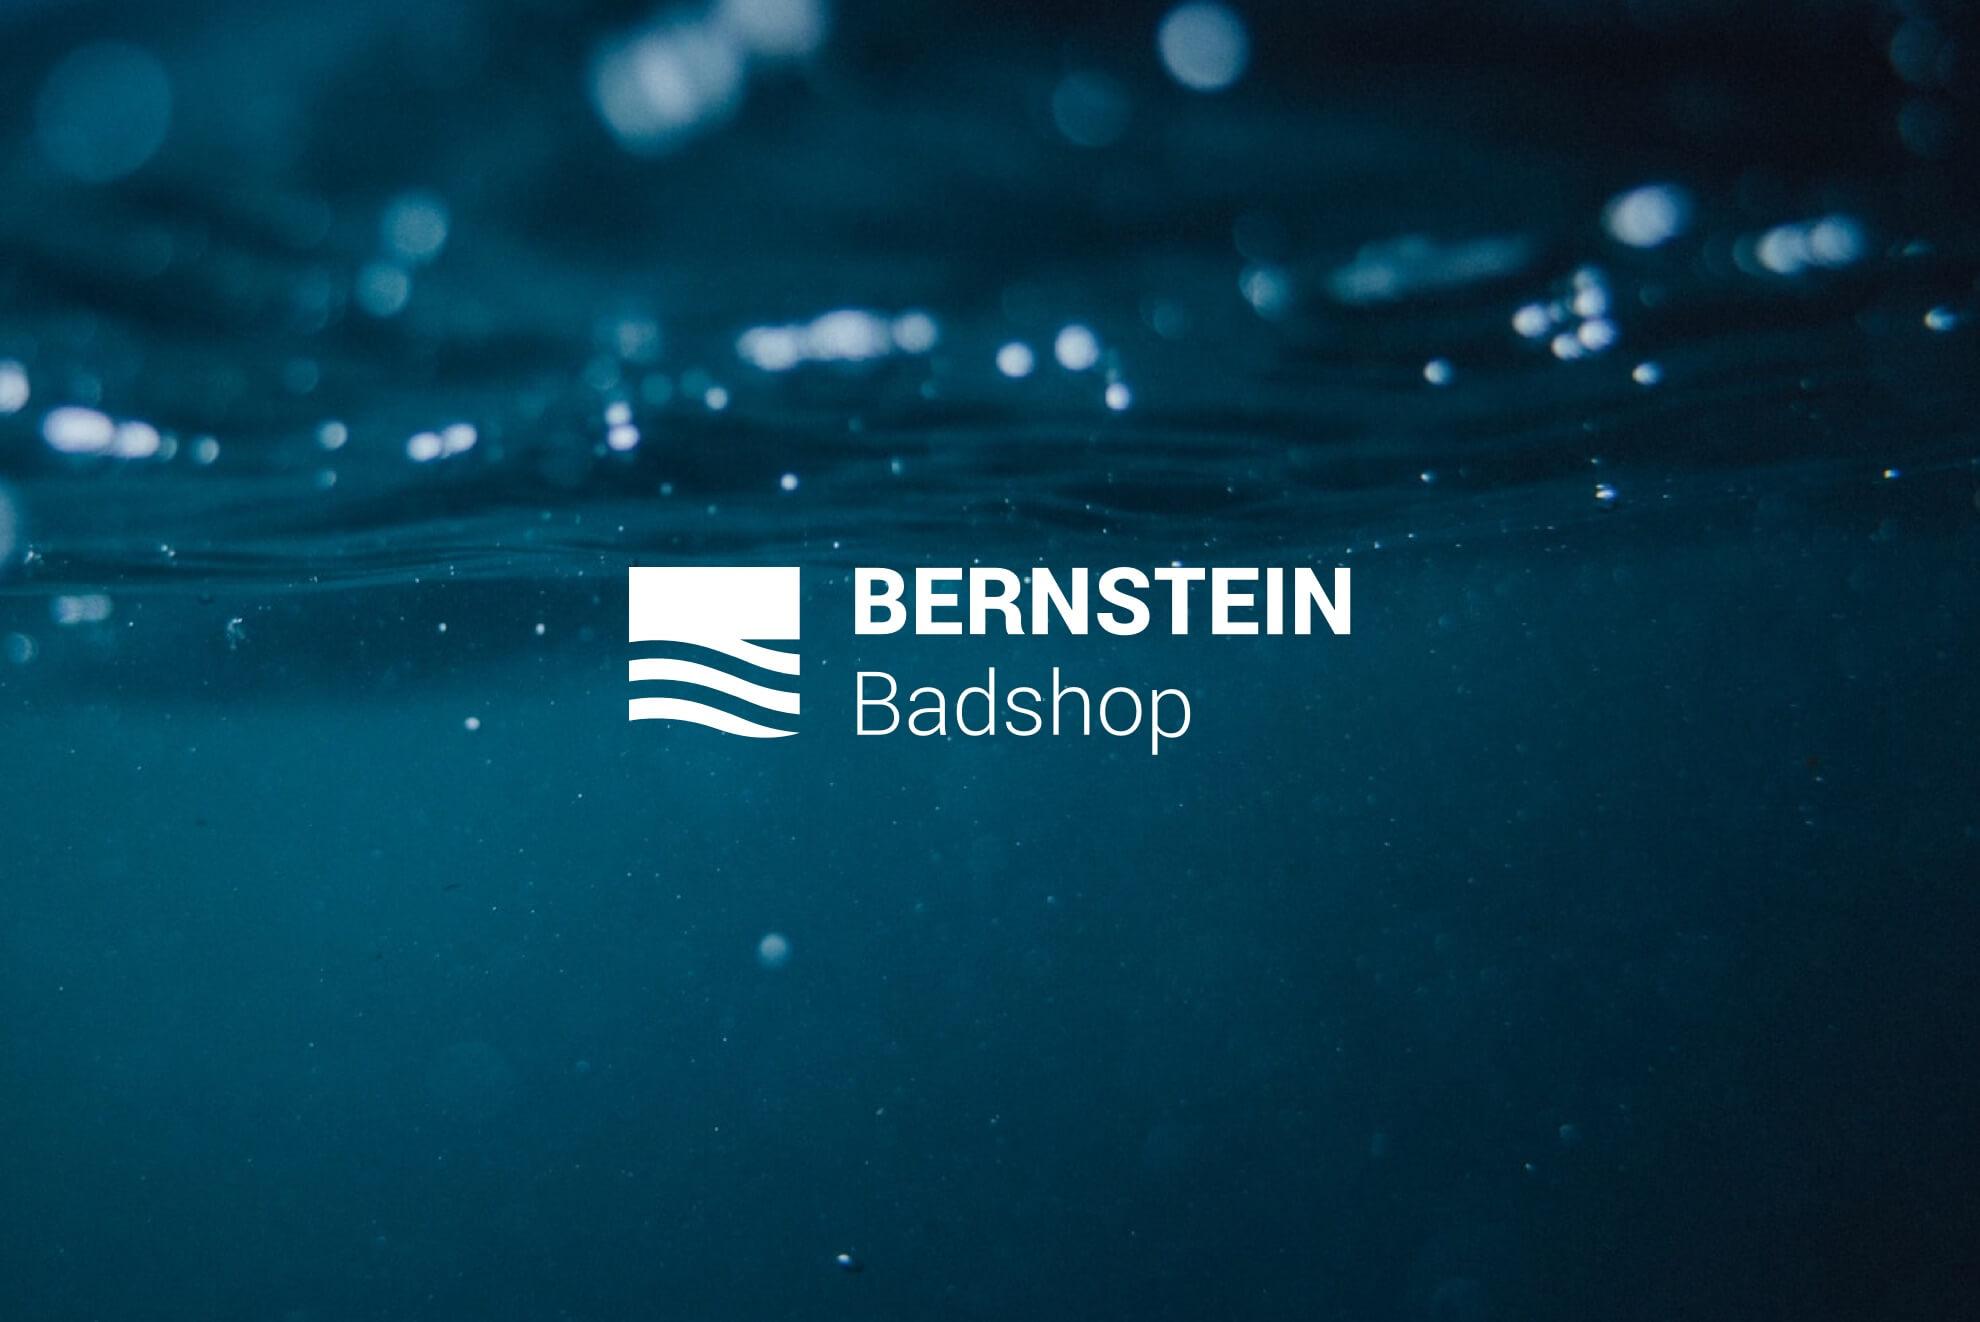 Bernstein Badshop – Shopware 6, Corporate Design - E-Commerce